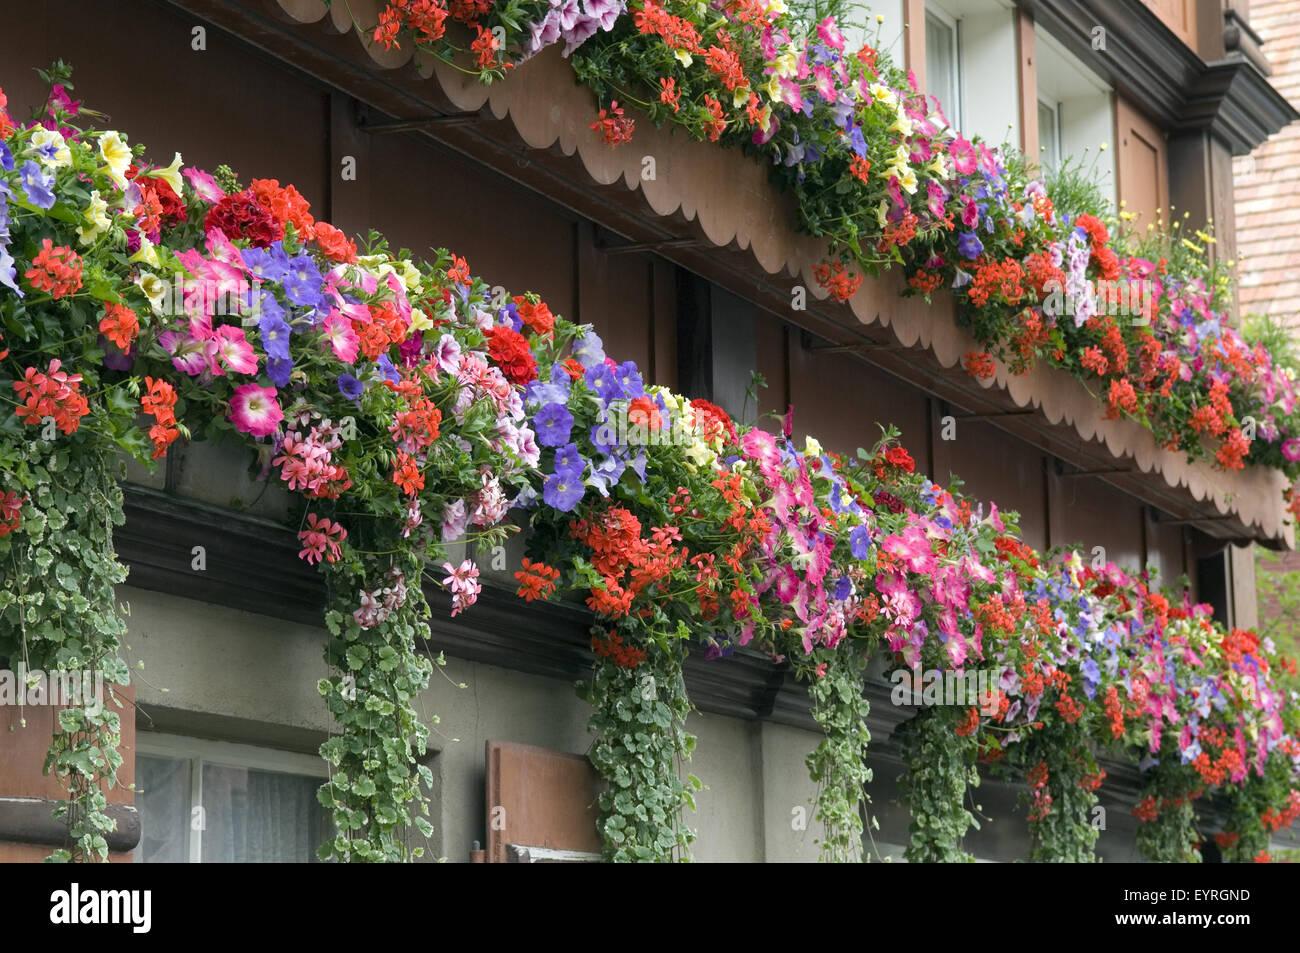 Balkonblumen Surfina Geranien Stock Photo 85955225 Alamy